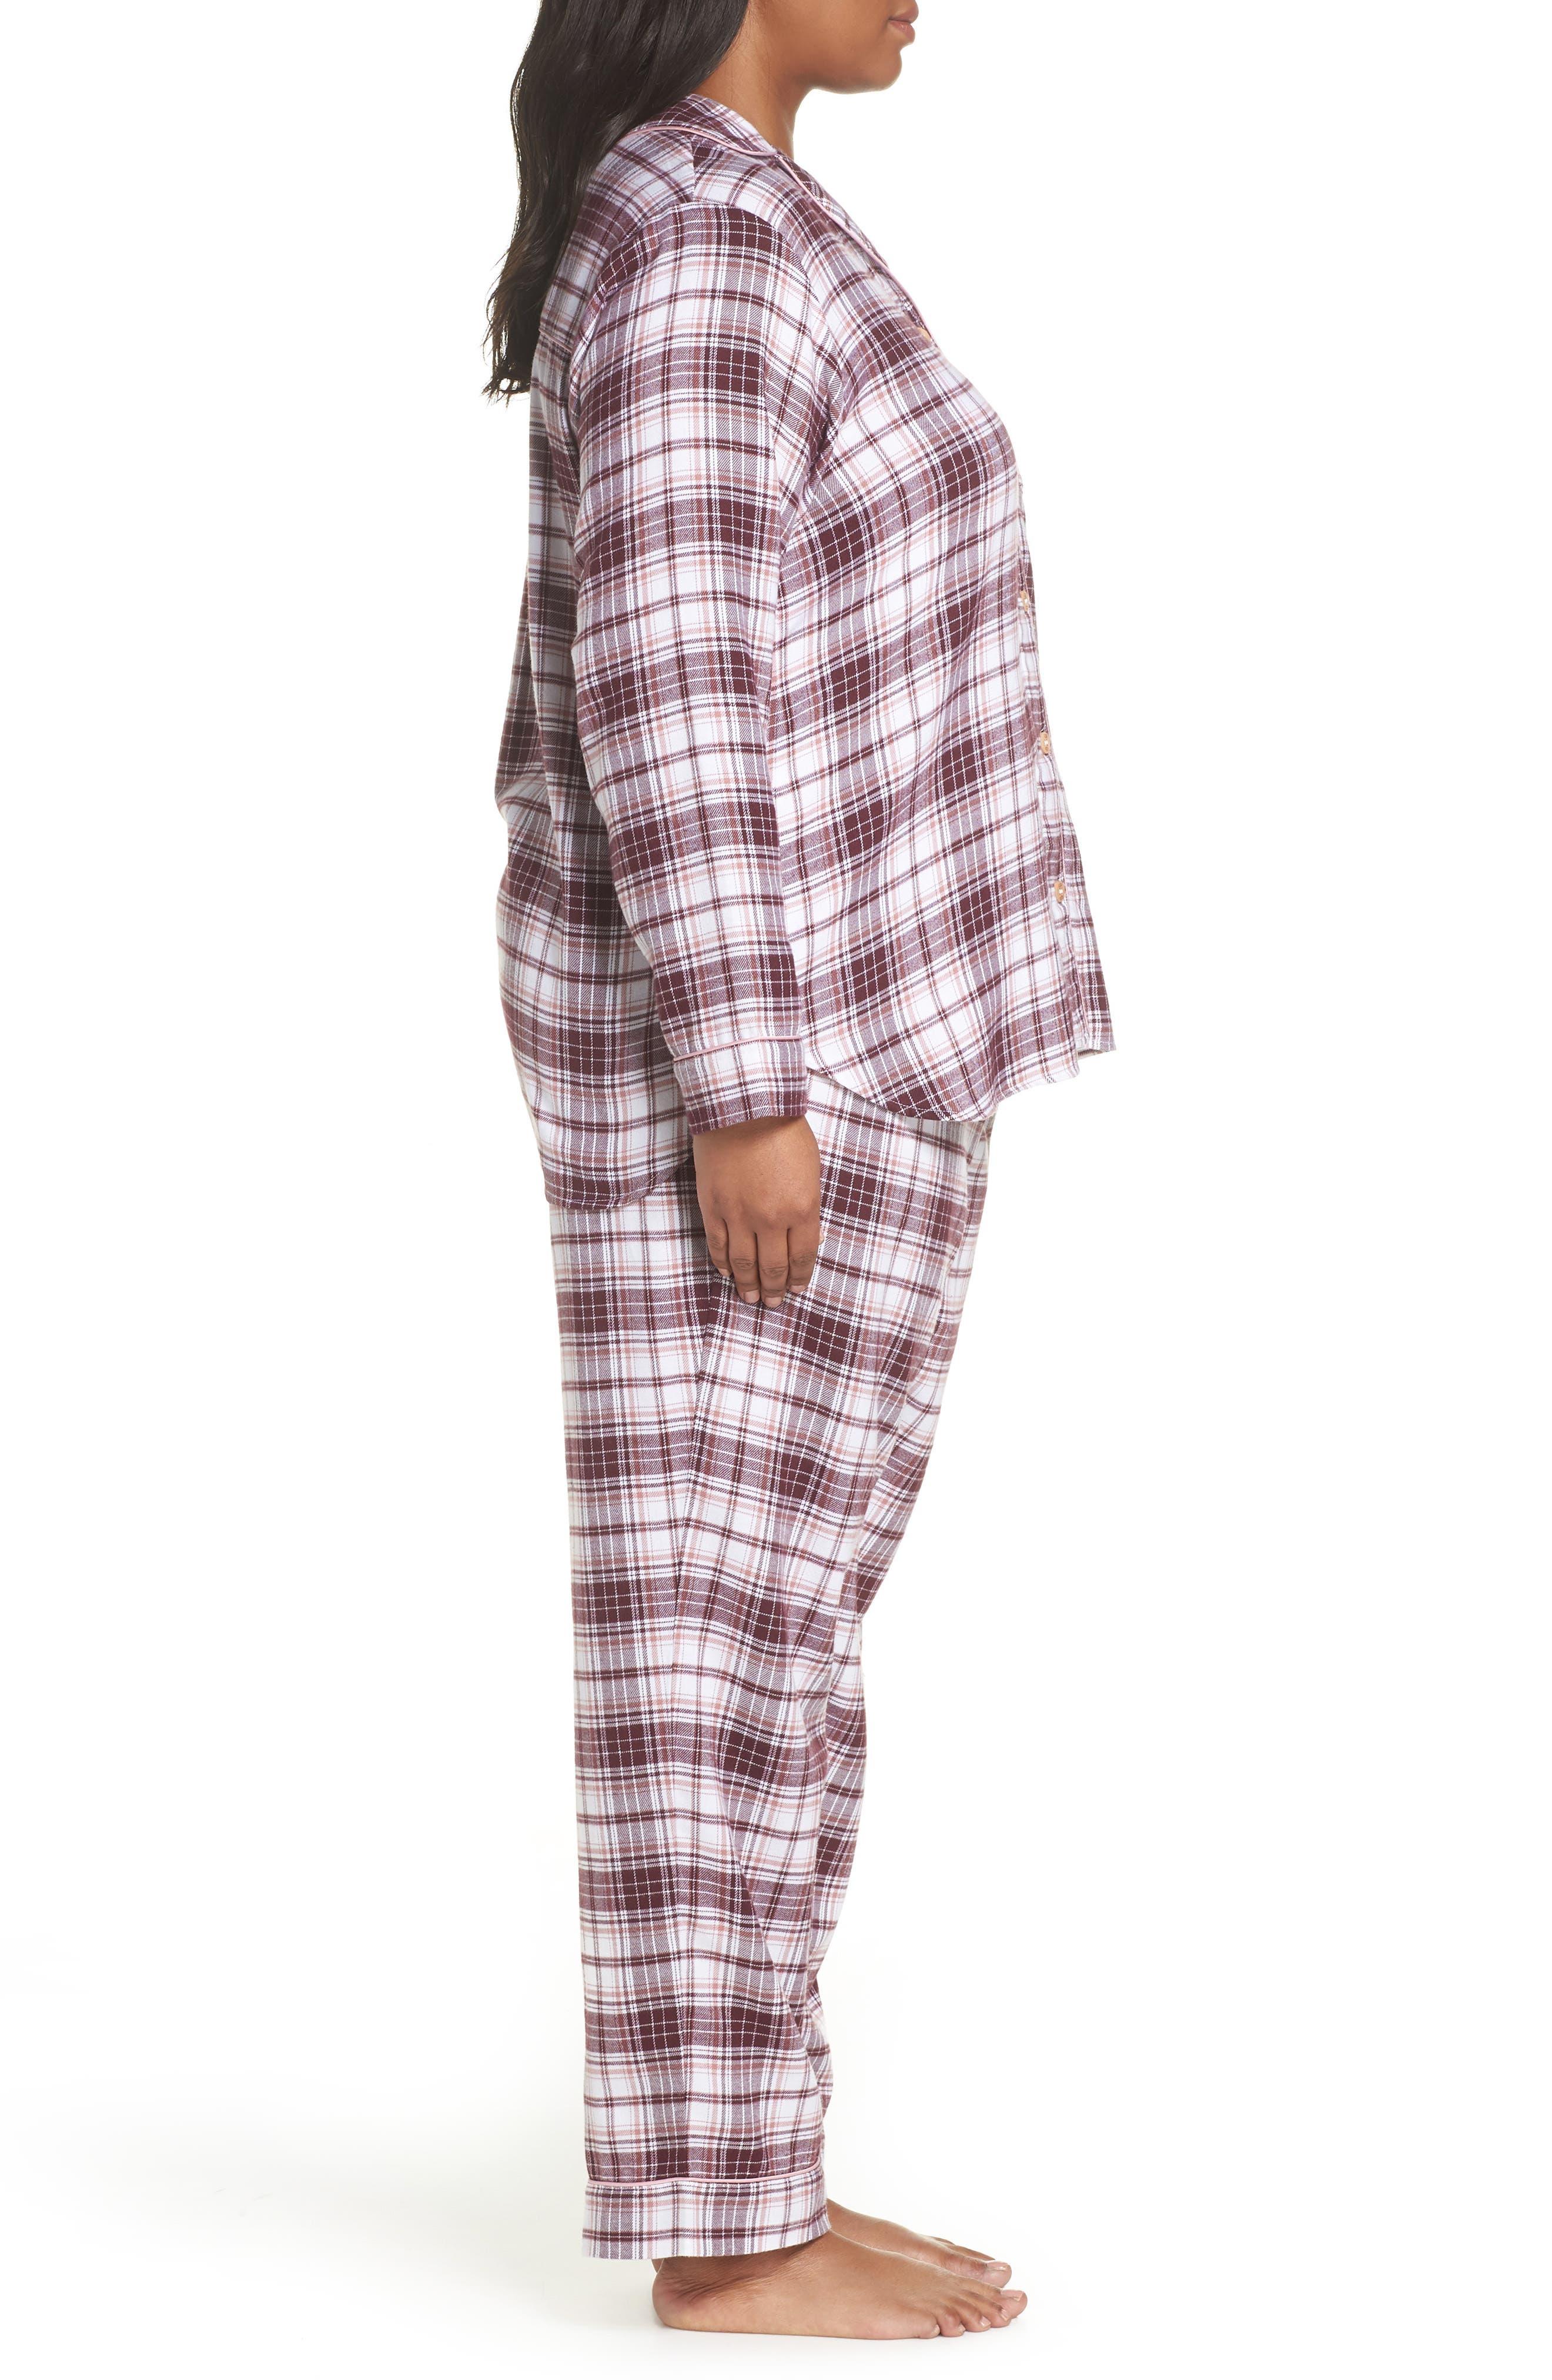 Raven Plaid Pajamas,                             Alternate thumbnail 3, color,                             PORT PLAID